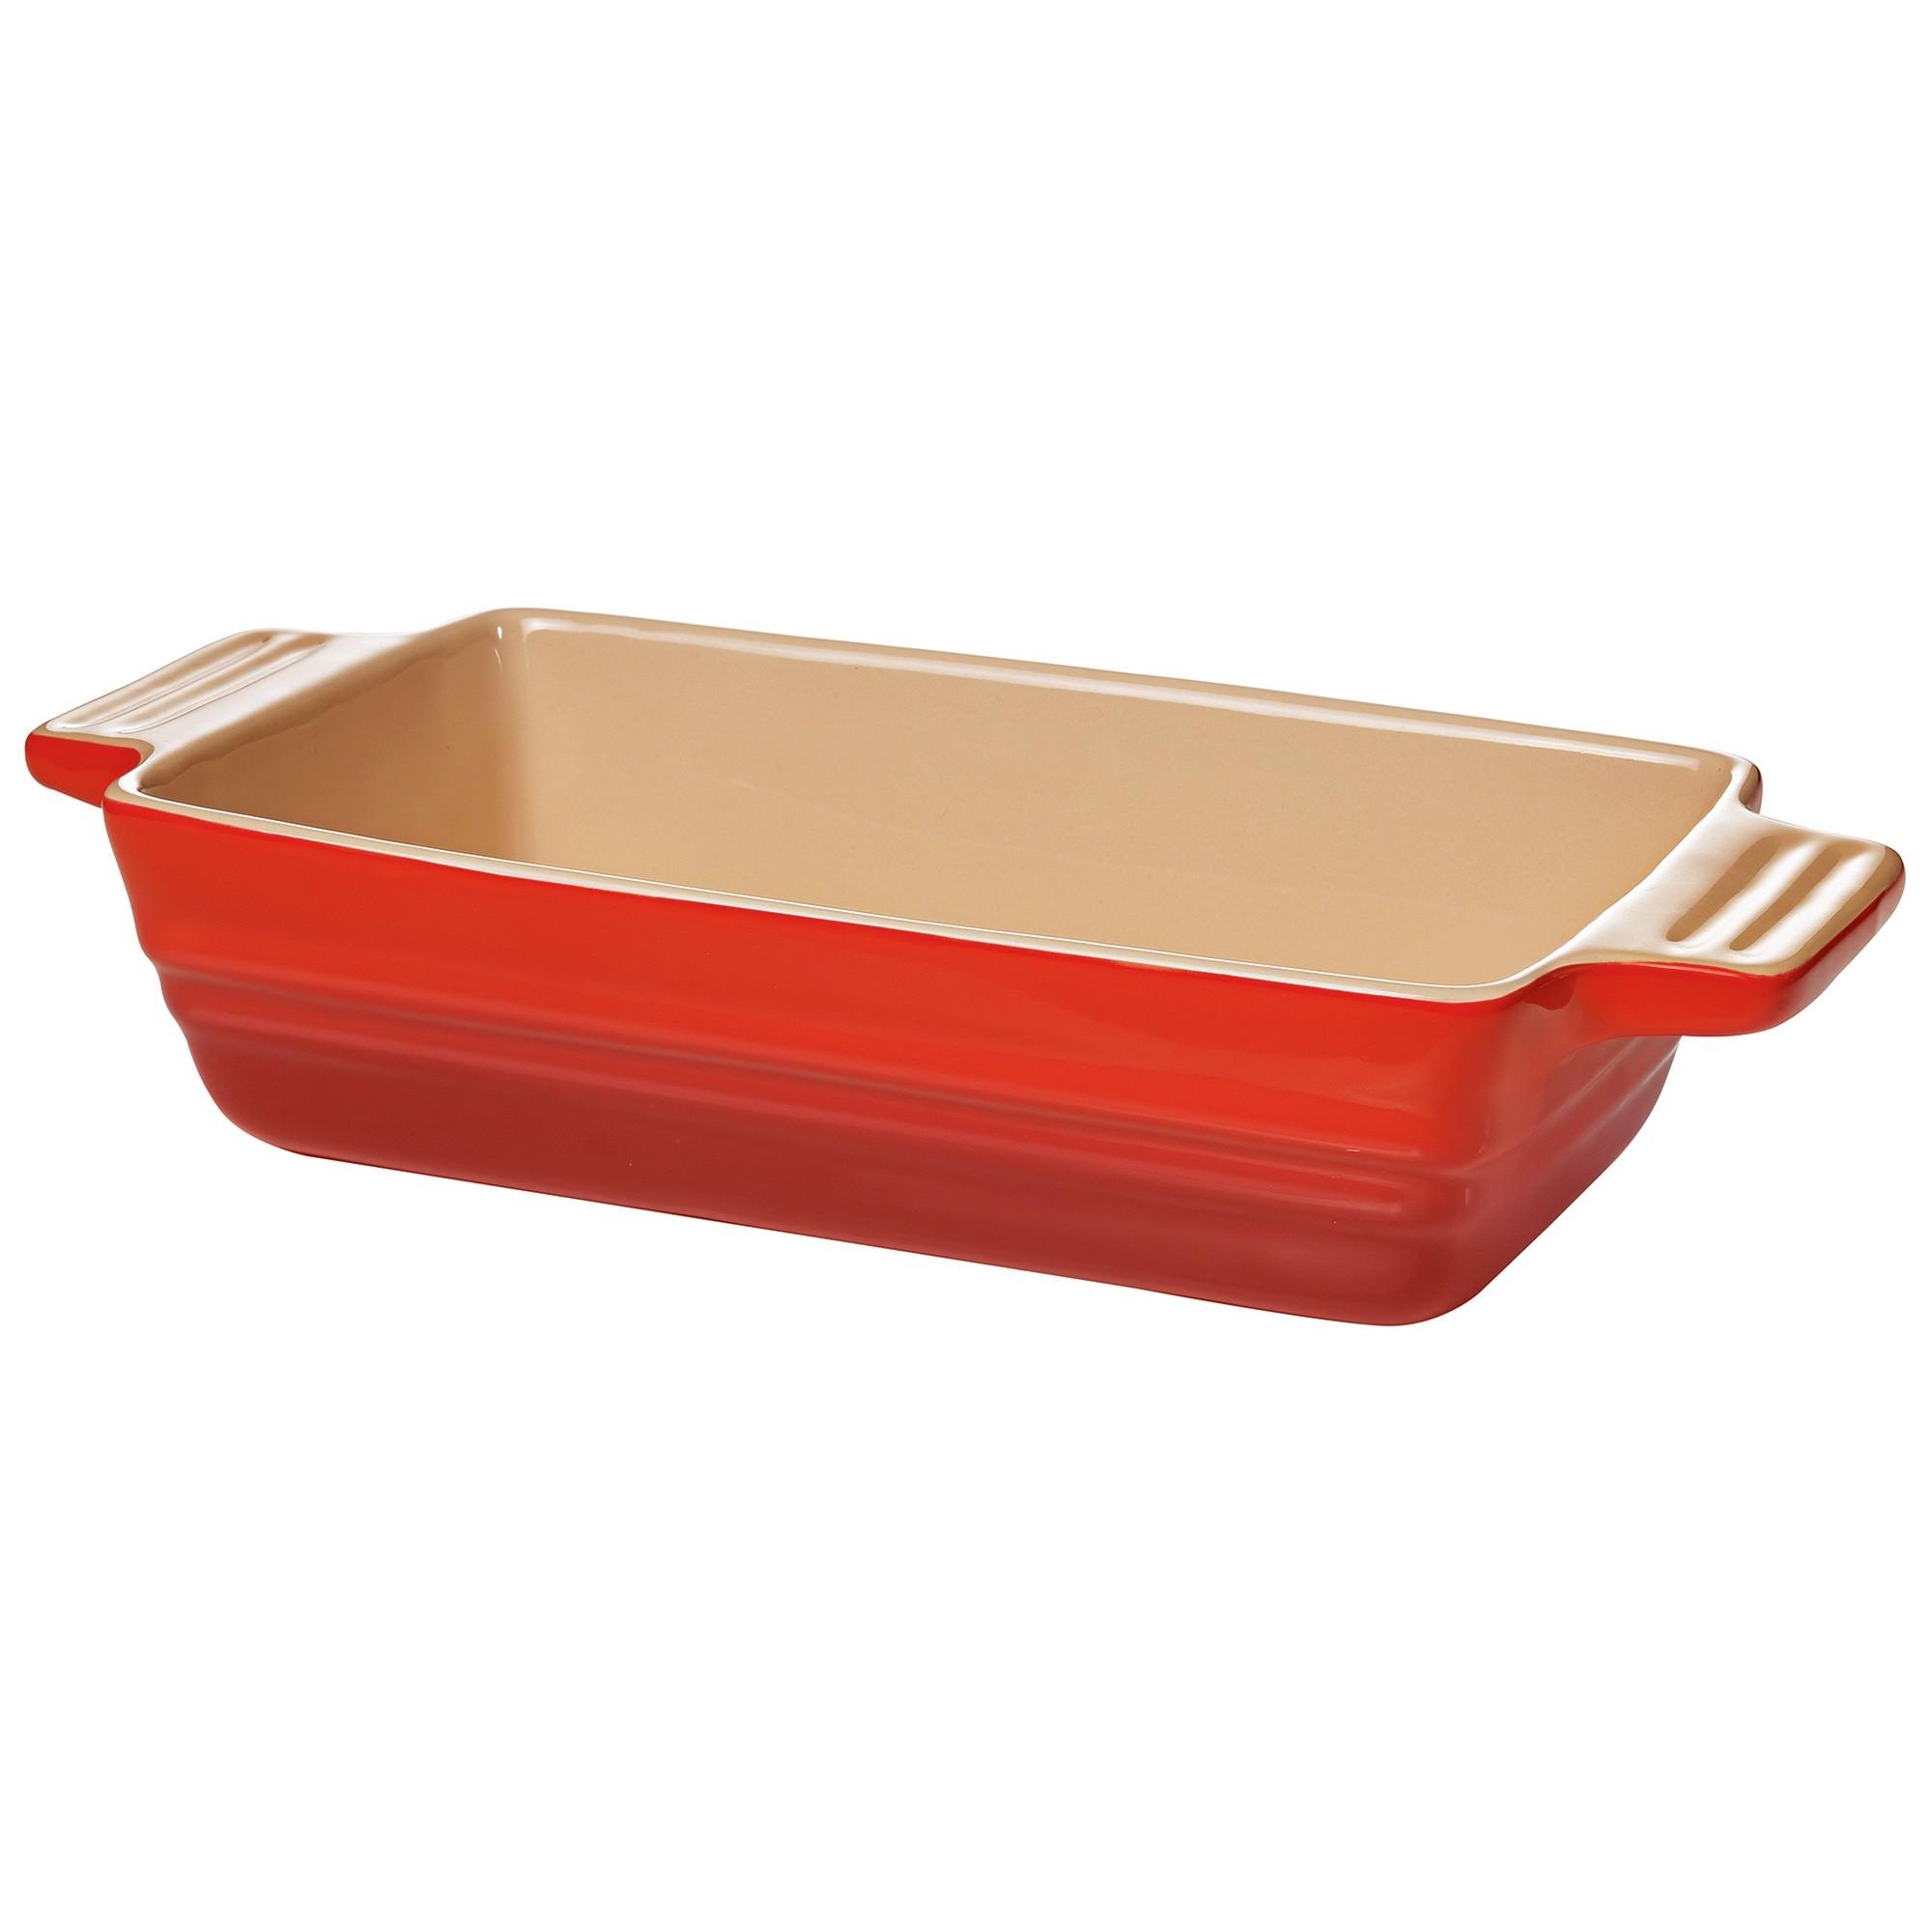 Chasseur La Cuisson 22x13cm Loaf Baker - Red